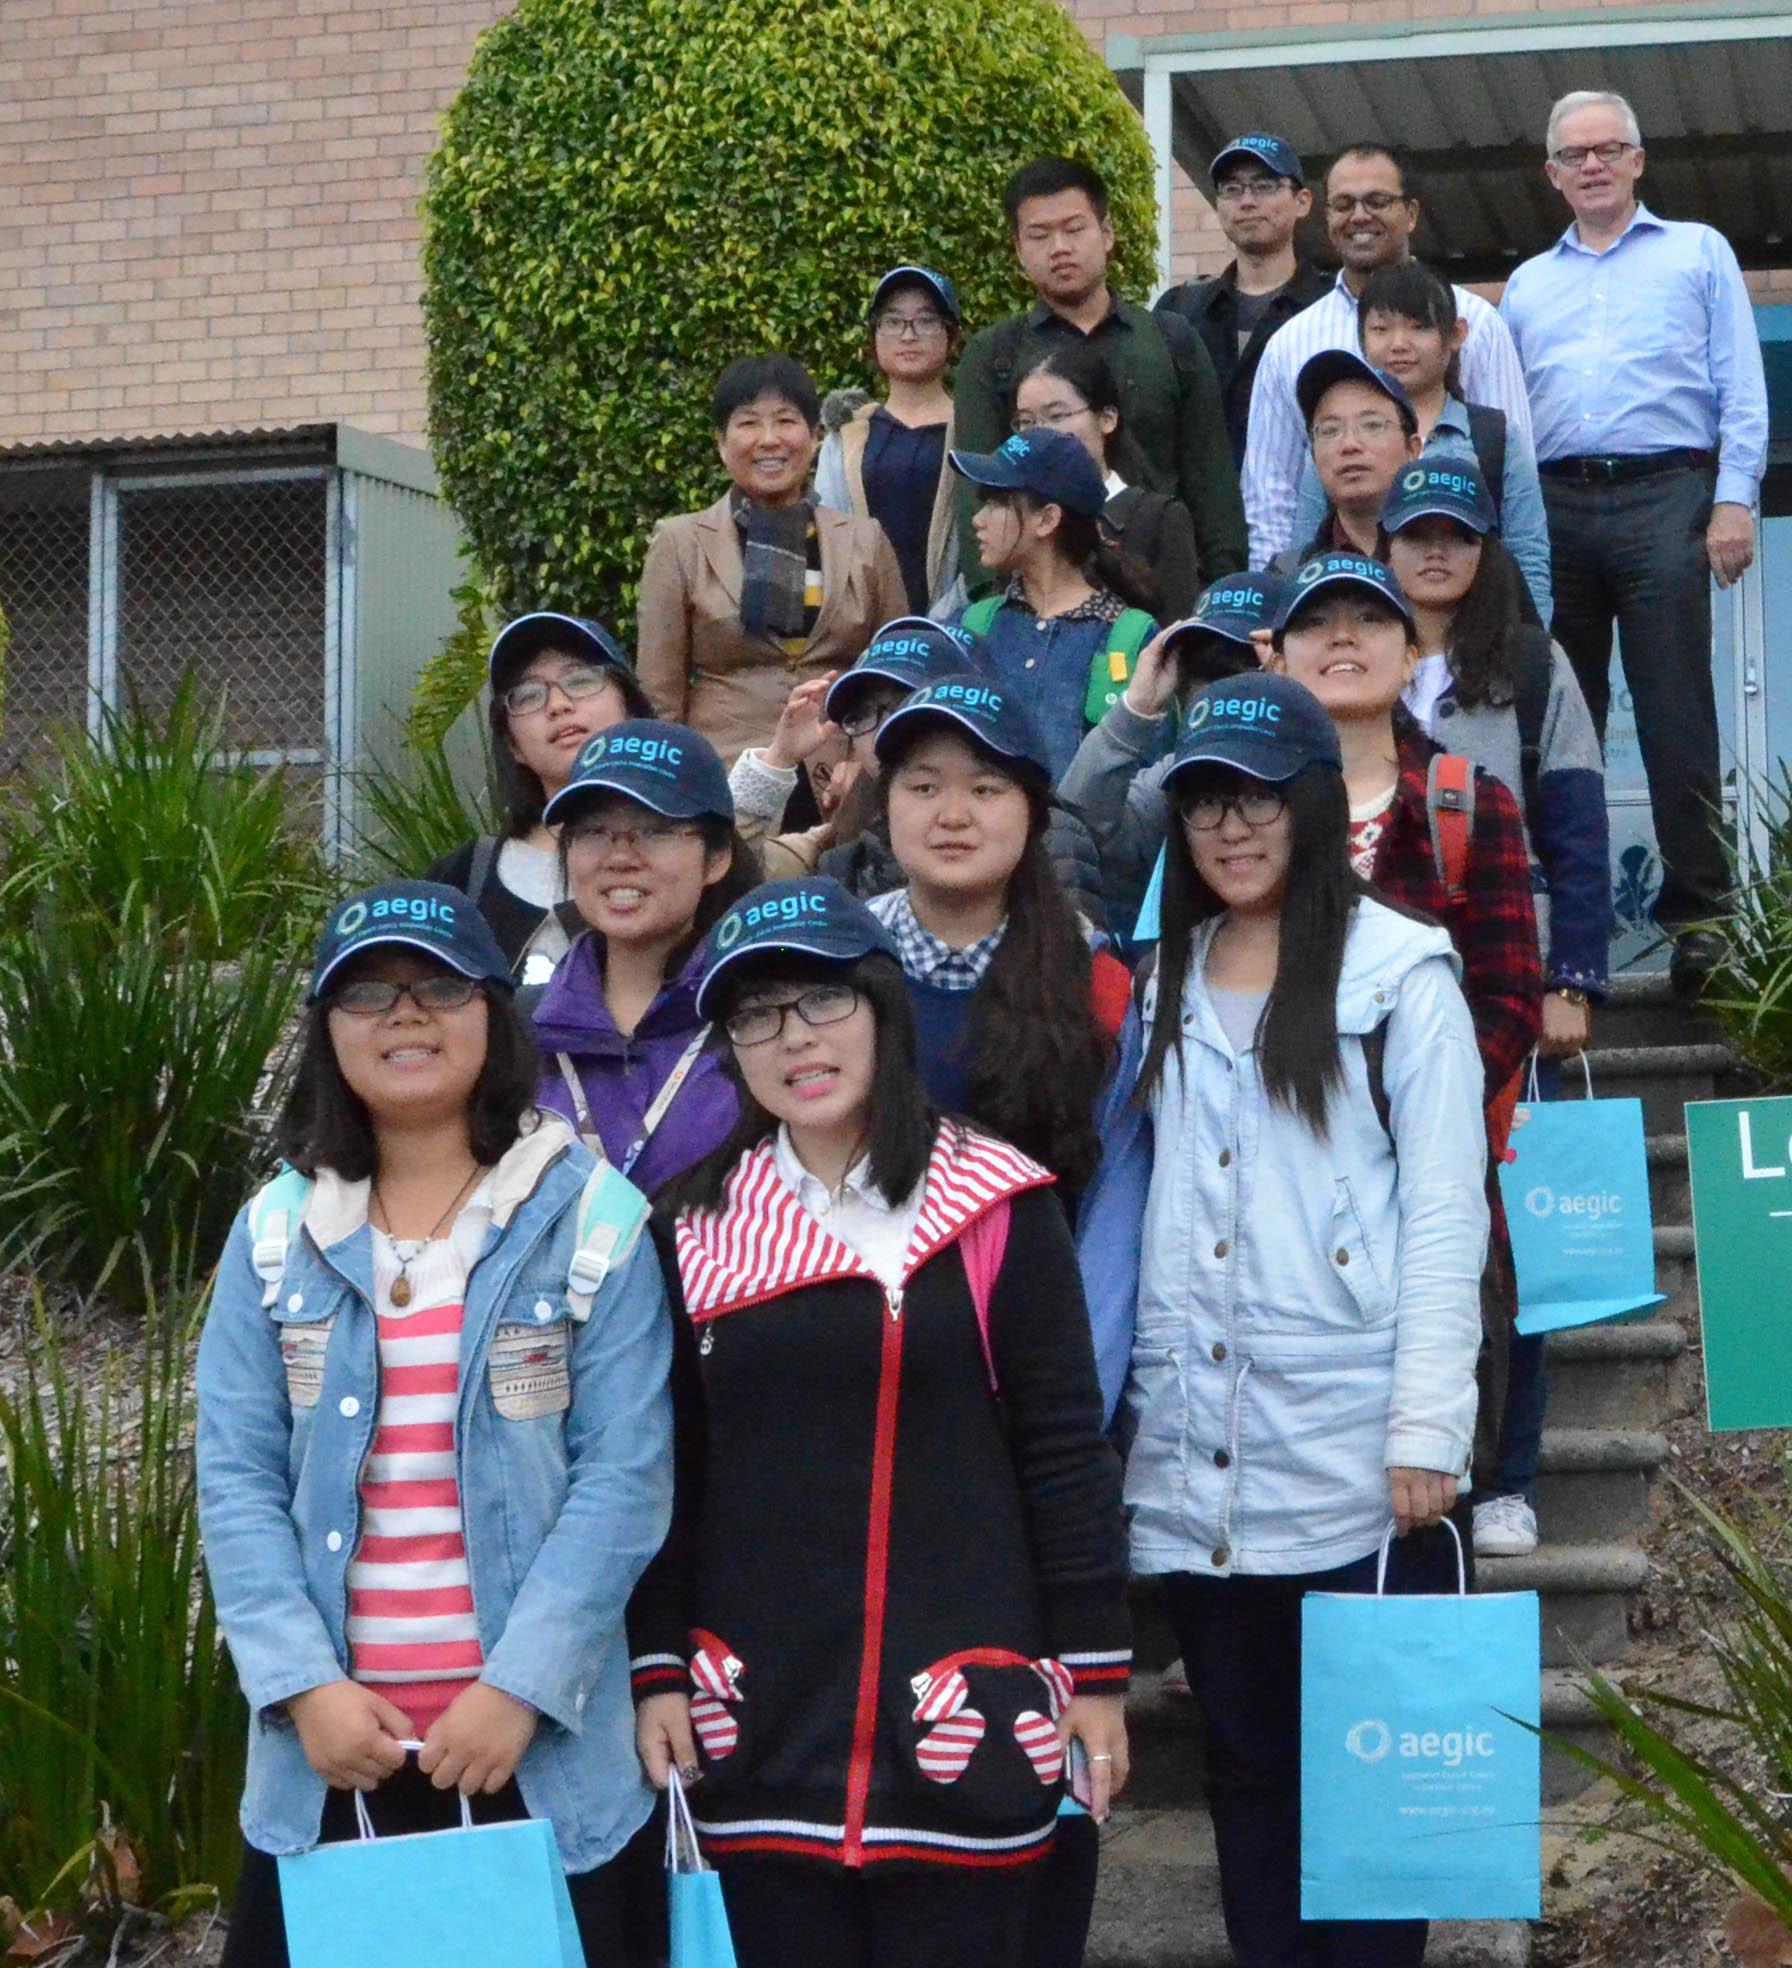 150814 Murdoch Chinese visit Group cropped.jpg